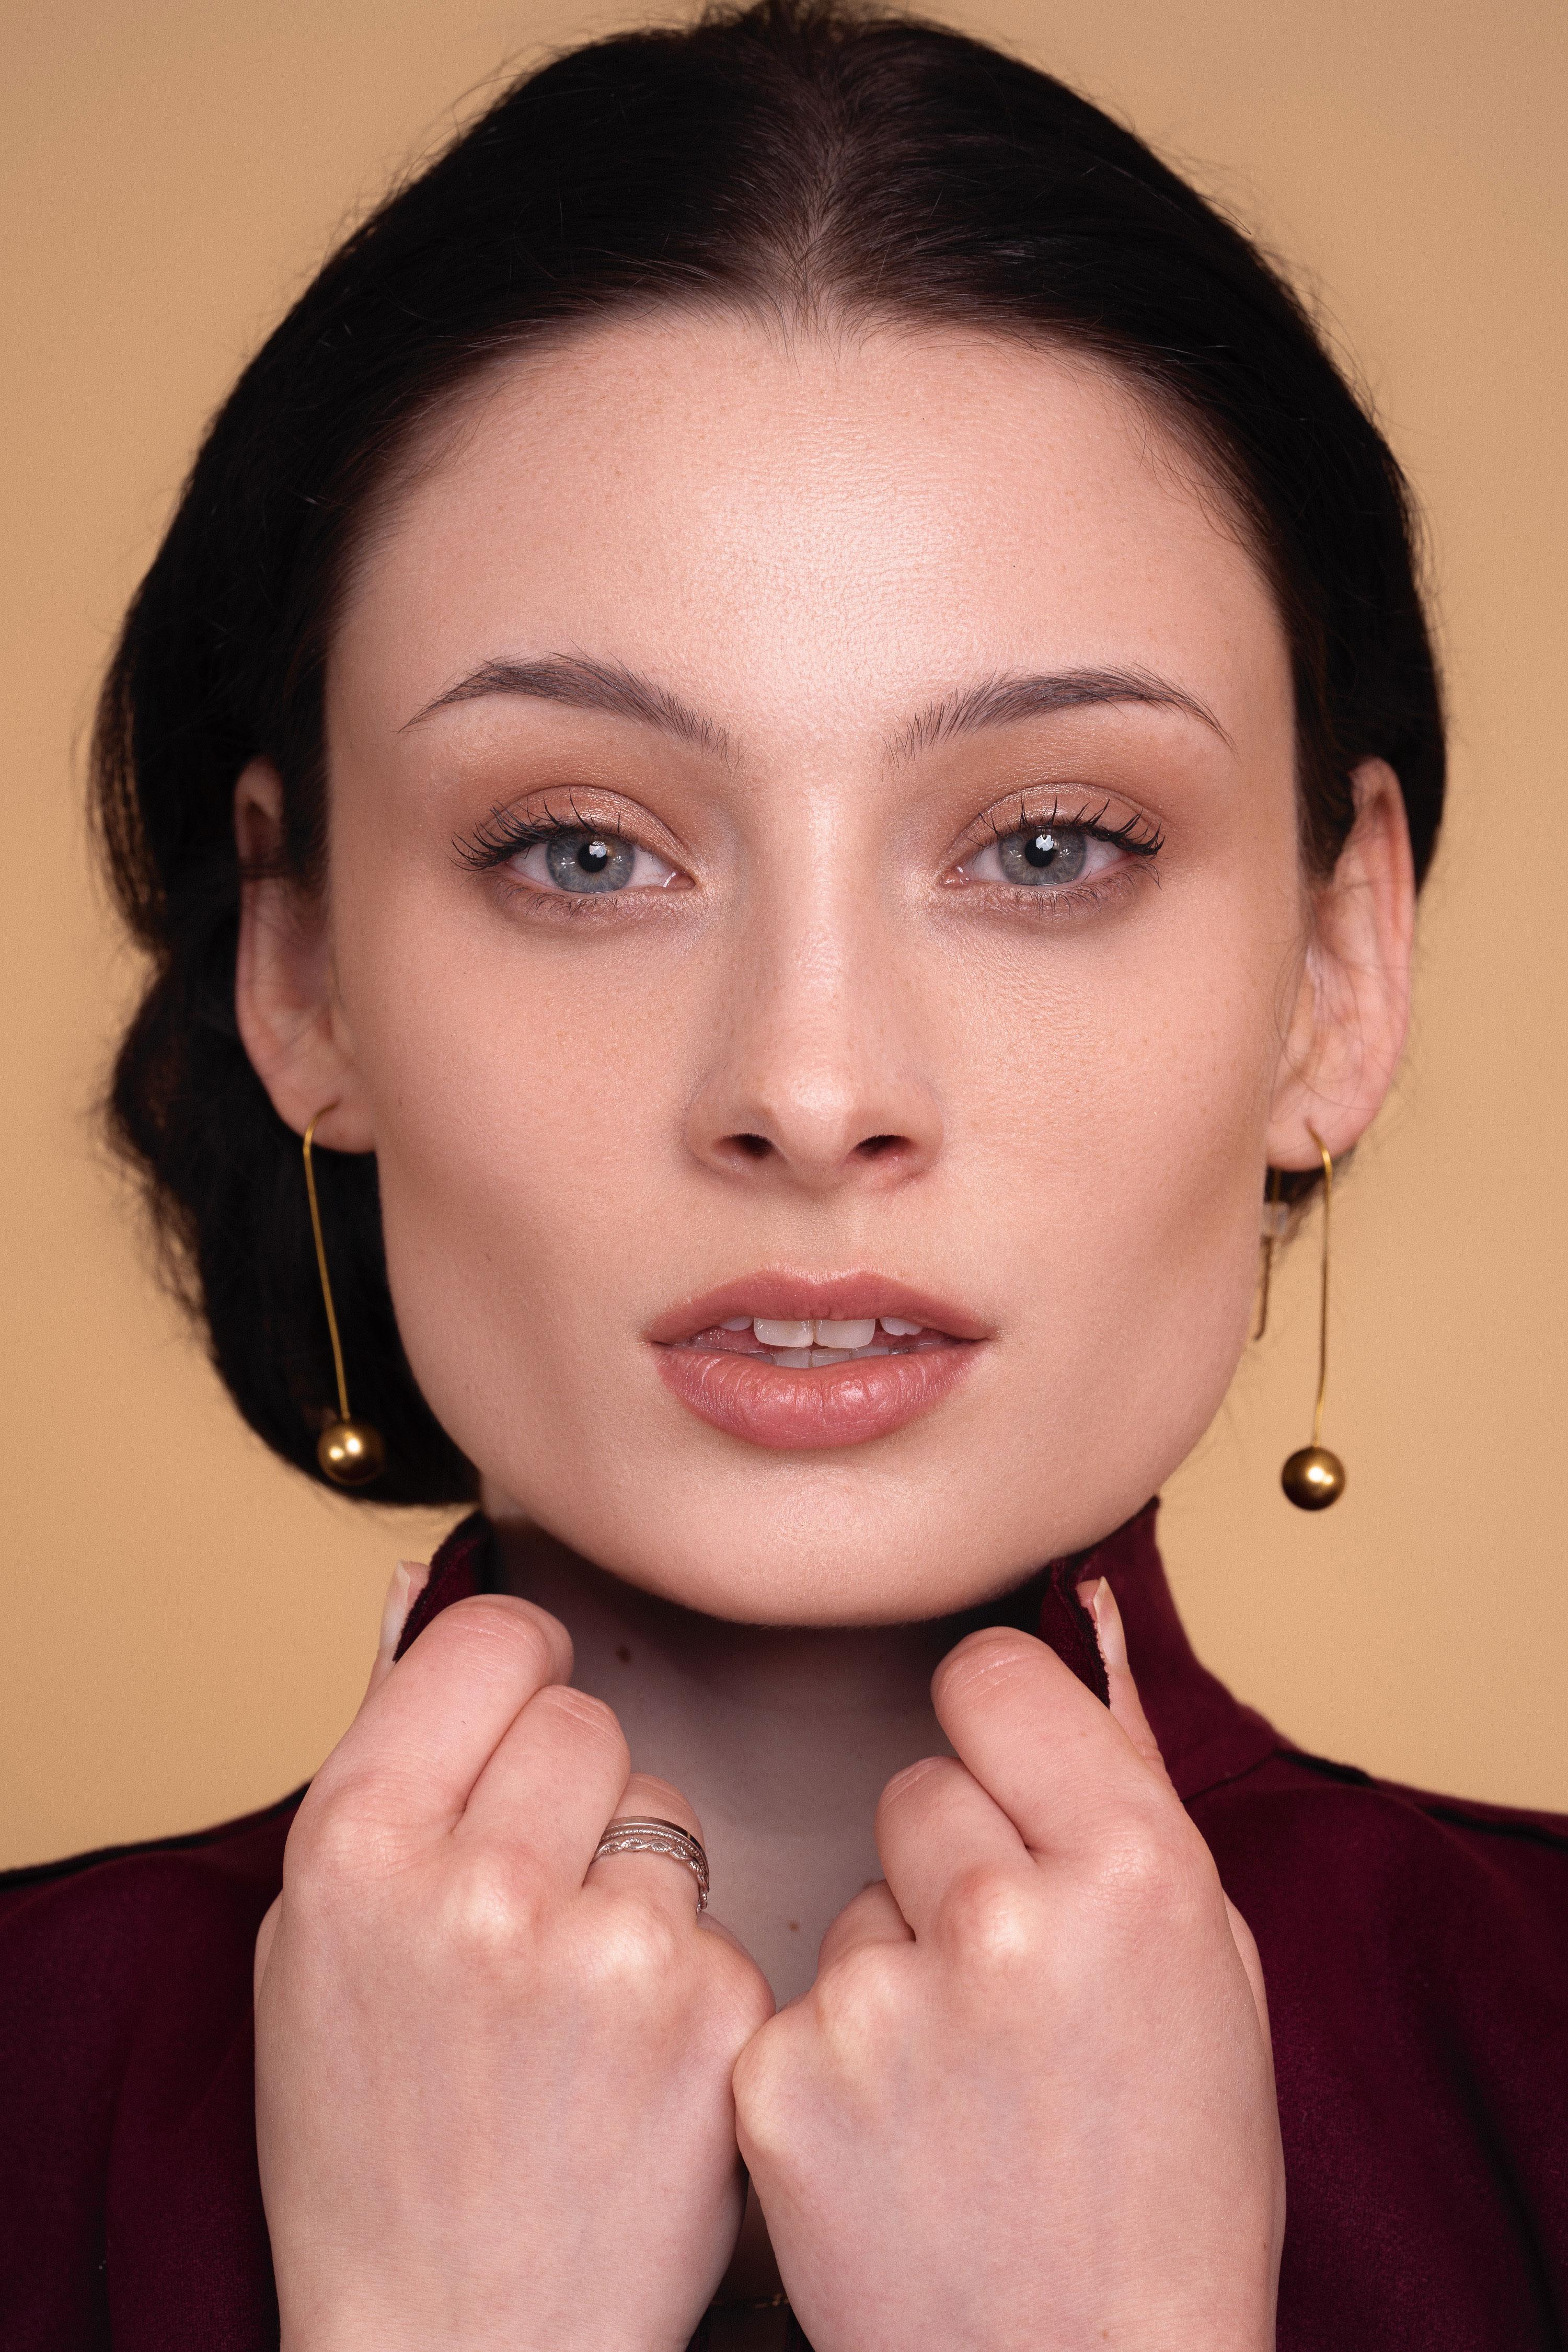 Shine-Female-Model-Lousia-HD-3.jpg#asset:52780